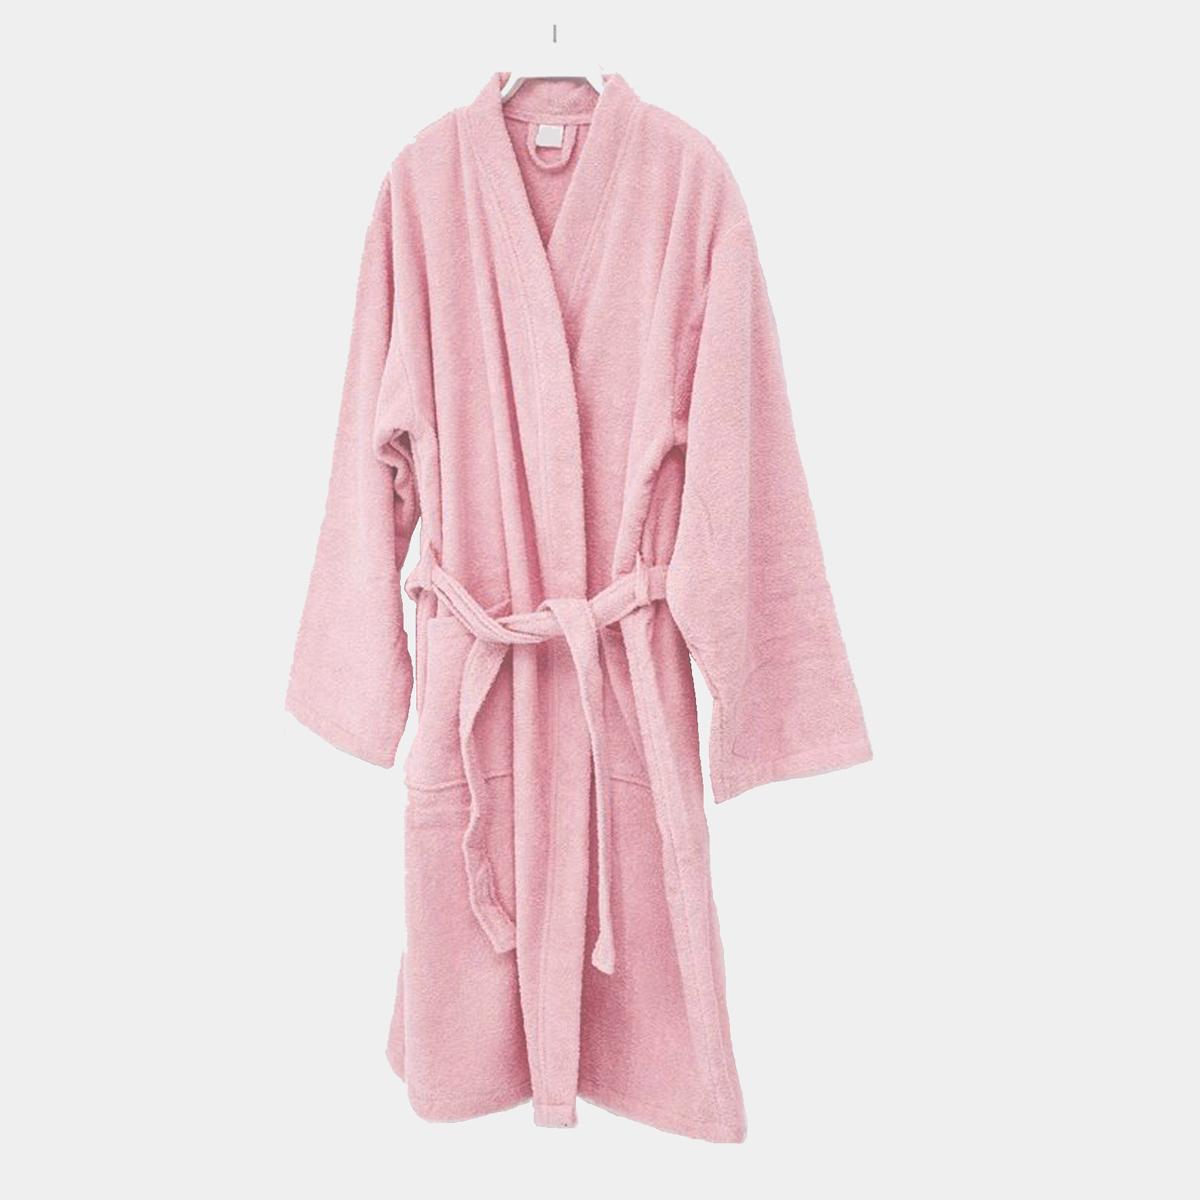 Банный халат Miranda Soft Цвет: Пудра (S) Arya ar359644